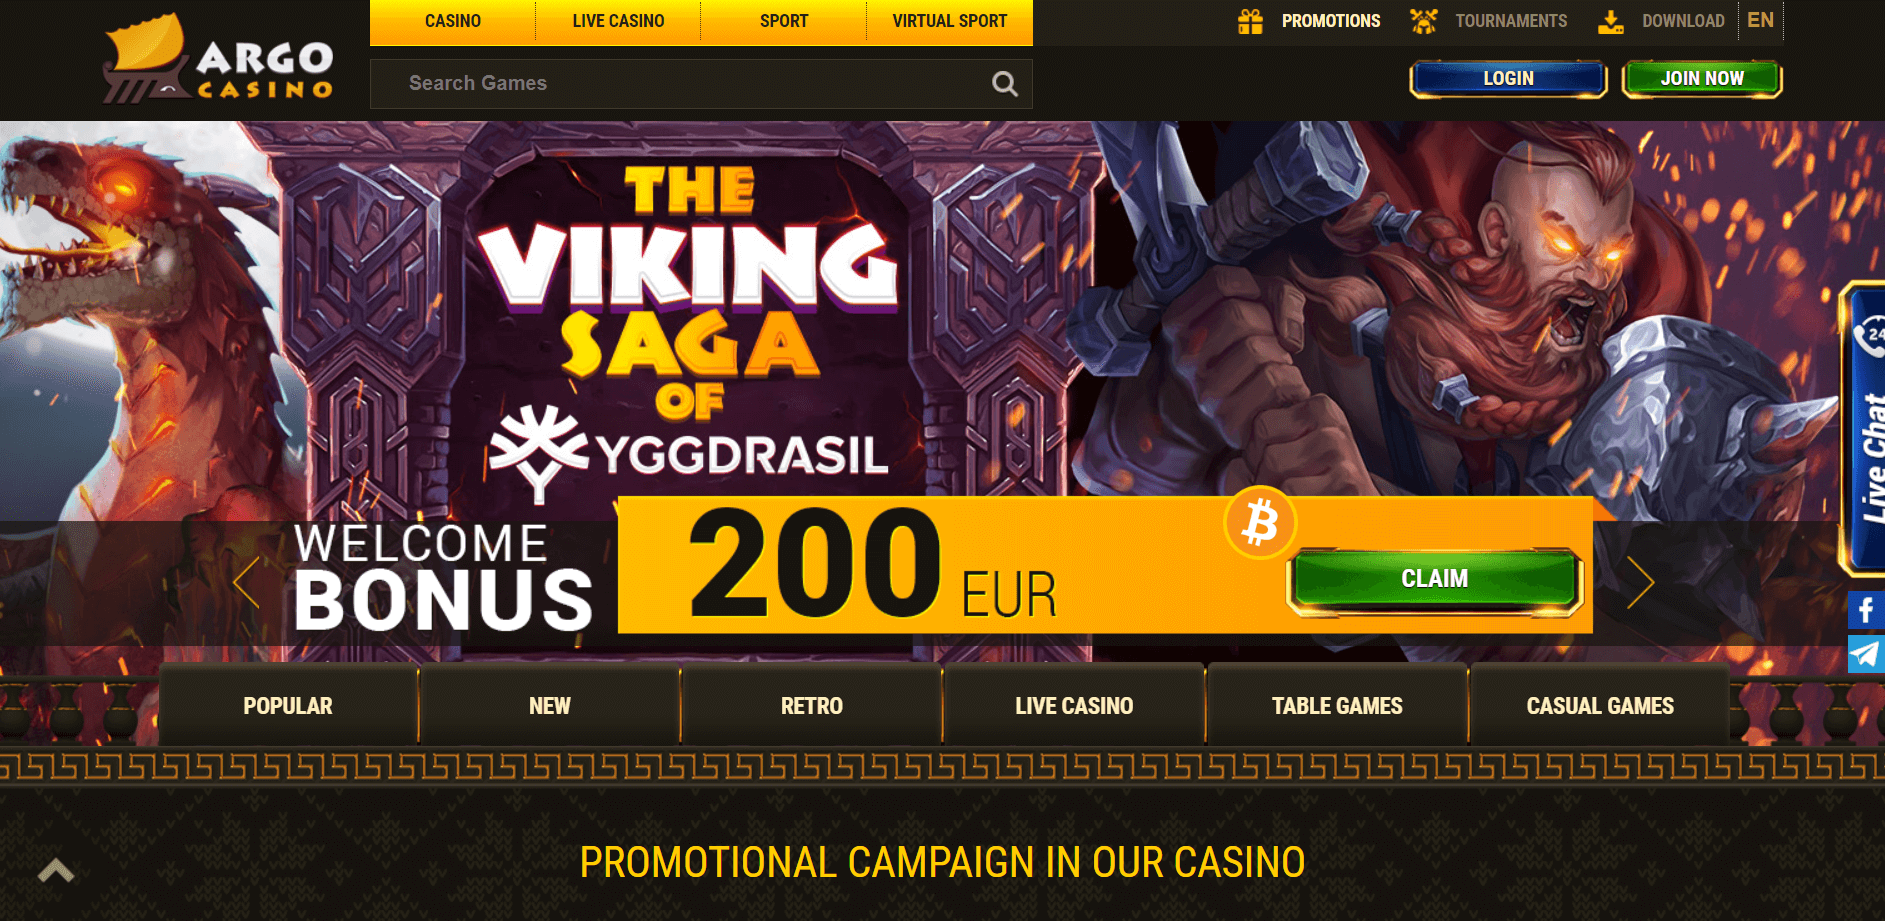 Prism Casino No Deposit Bonus Codes May 2020